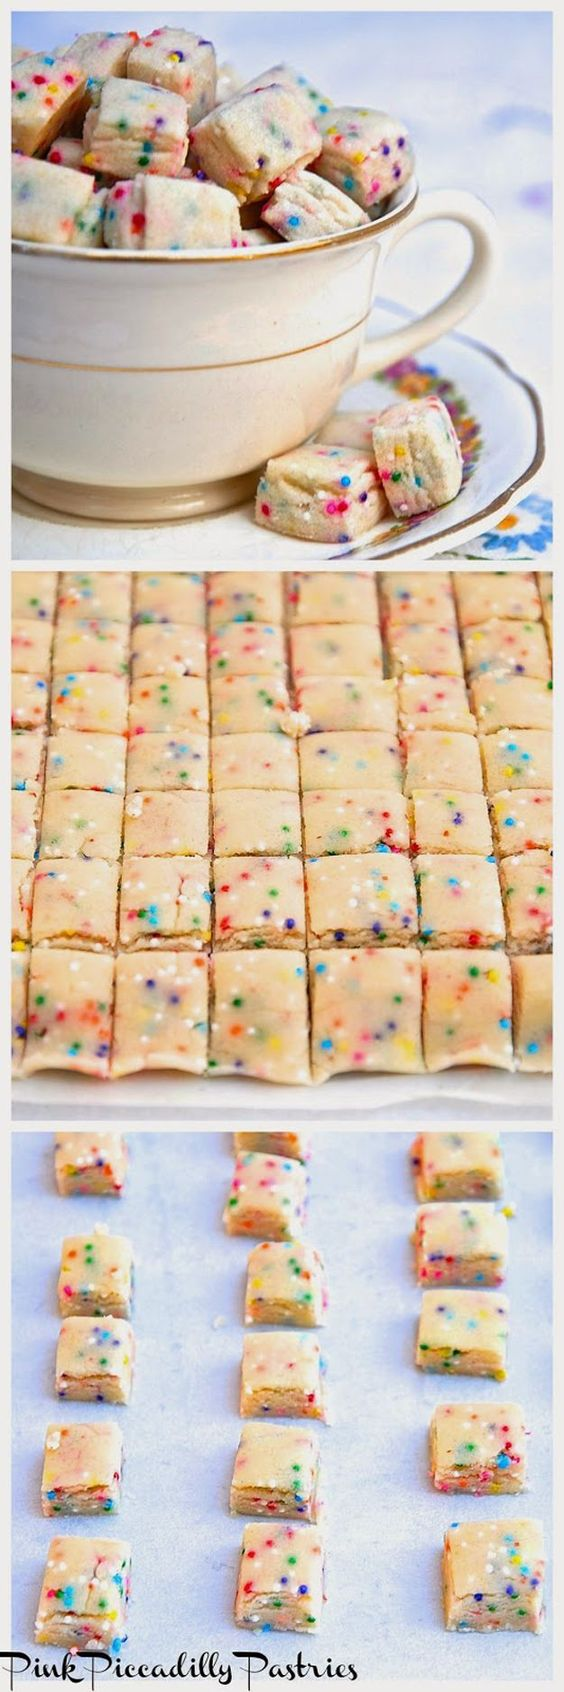 Easy fairy bite treats all kids will love! Fancy DIY Tea Party Treat for Kids by DIY Ready at http://diyready.com/kids-tea-party-ideas/